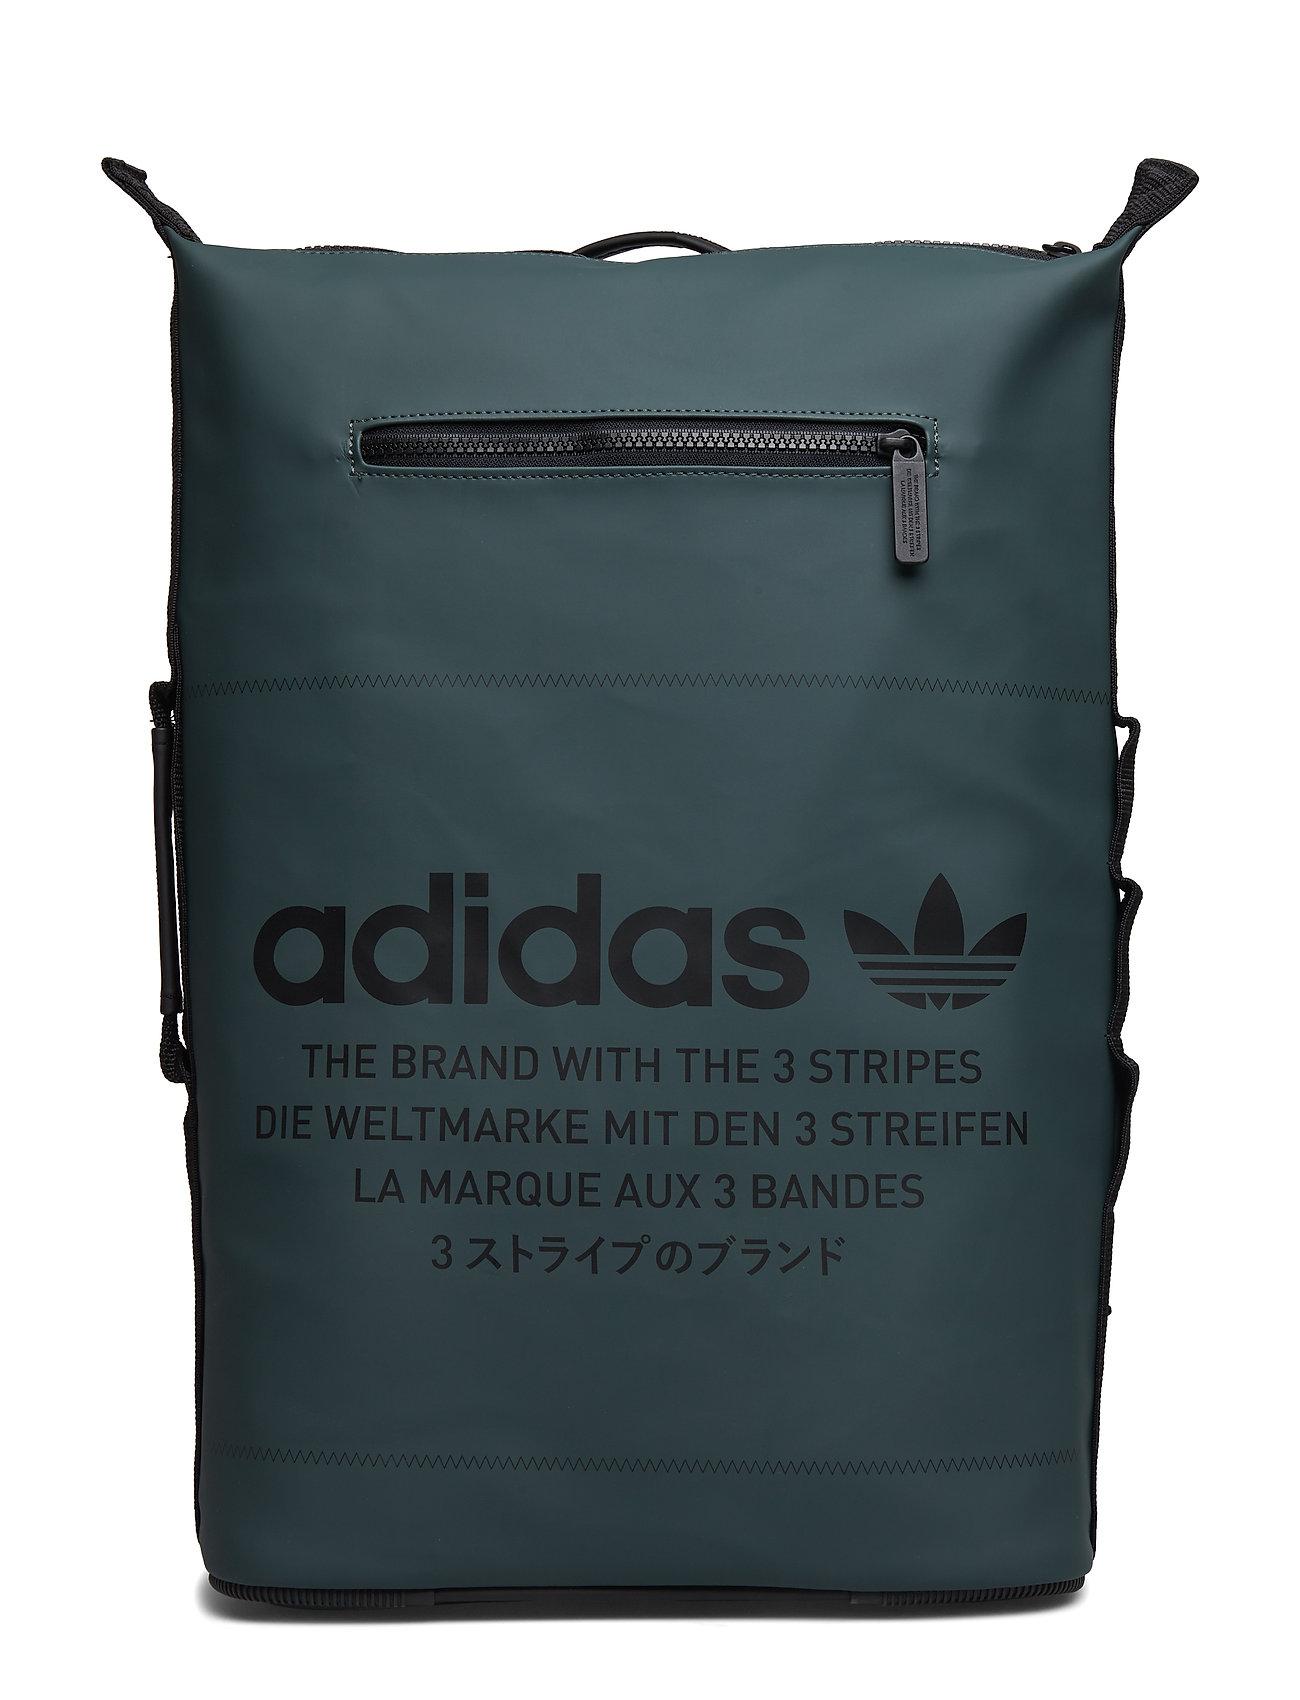 Adidas Nmd Bp S Rygsæk Taske Grøn ADIDAS ORIGINALS